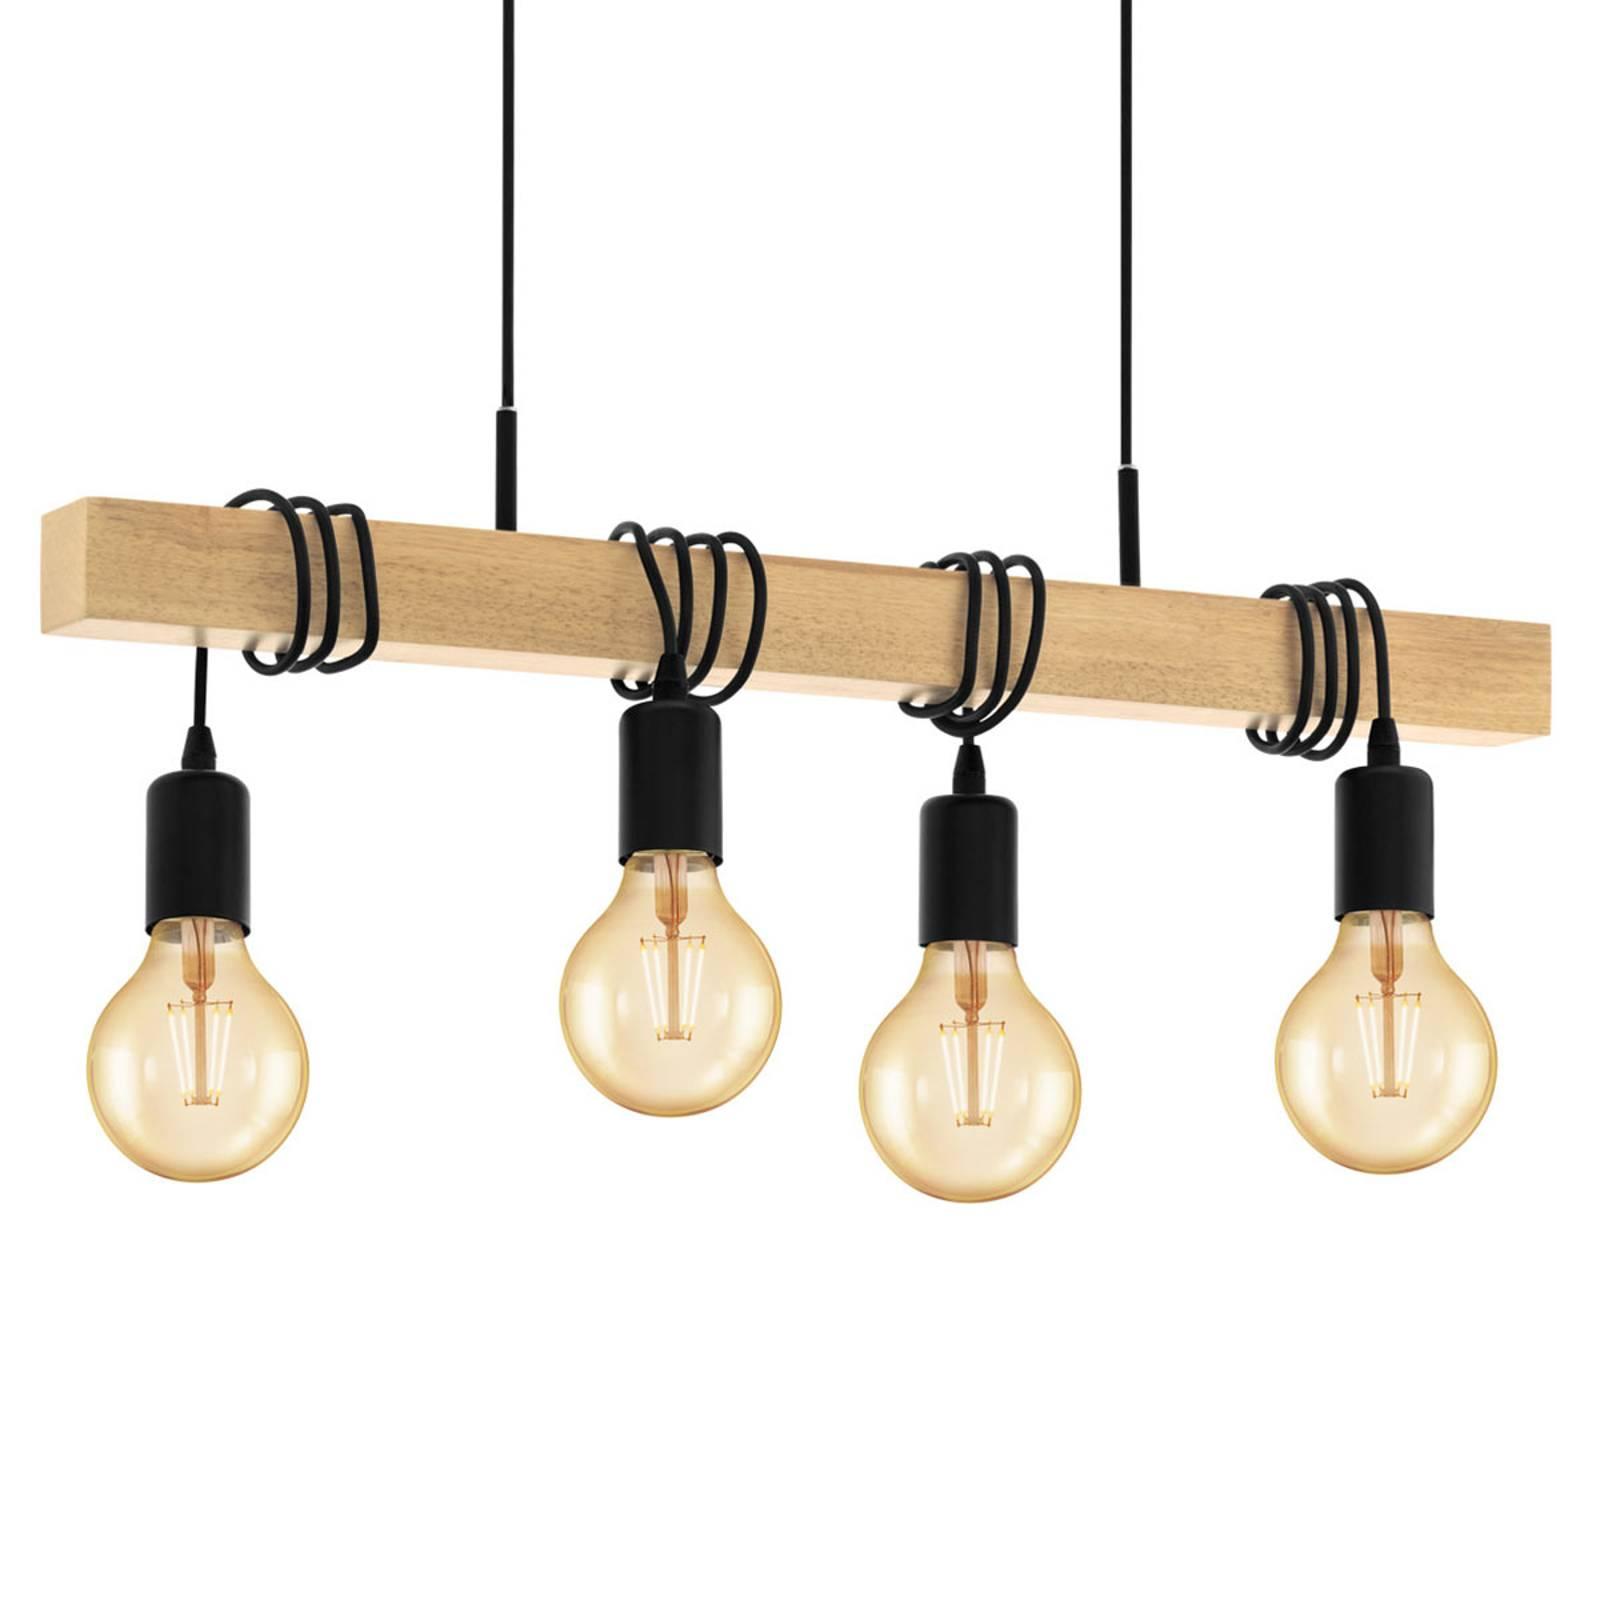 Lampa wisząca Townshend, 4-punktowa